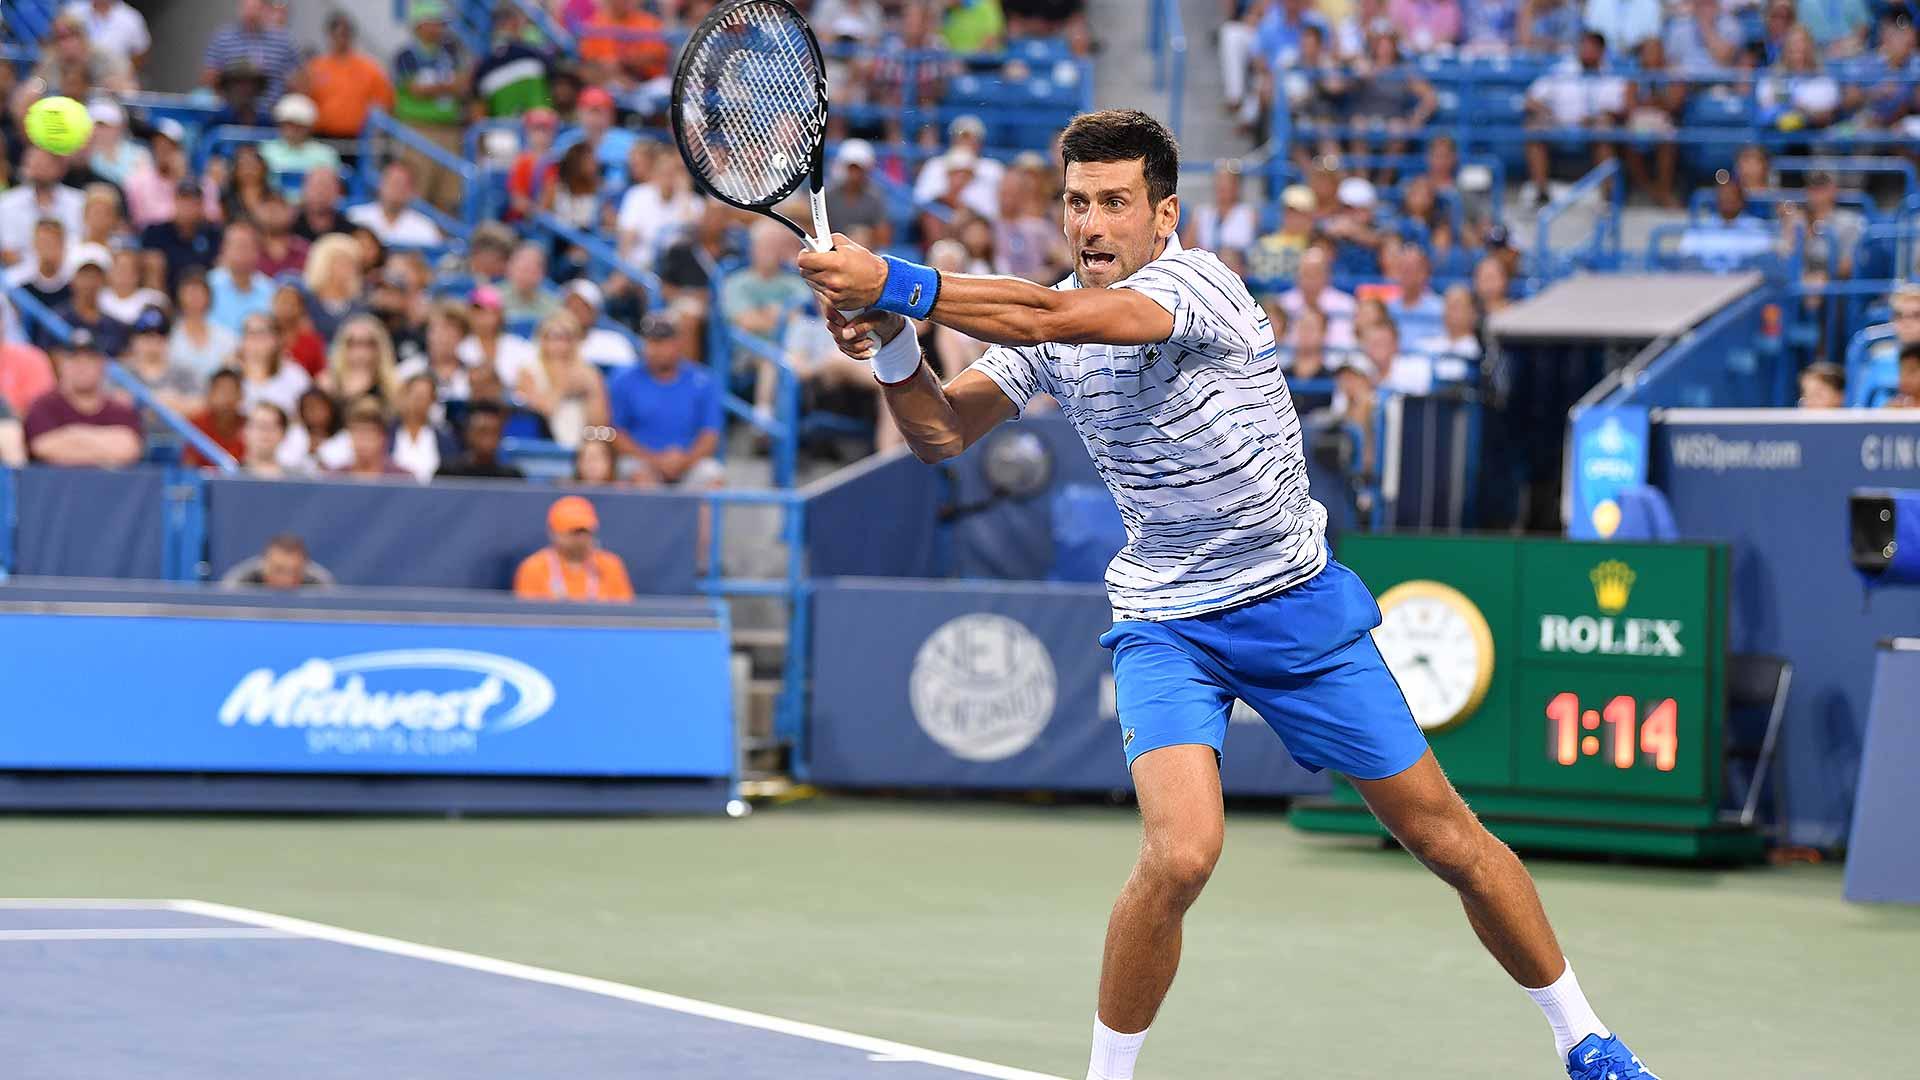 Novak Djokovic saves all four break points faced on Thursday against Pablo Carreno Busta in Cincinnati.